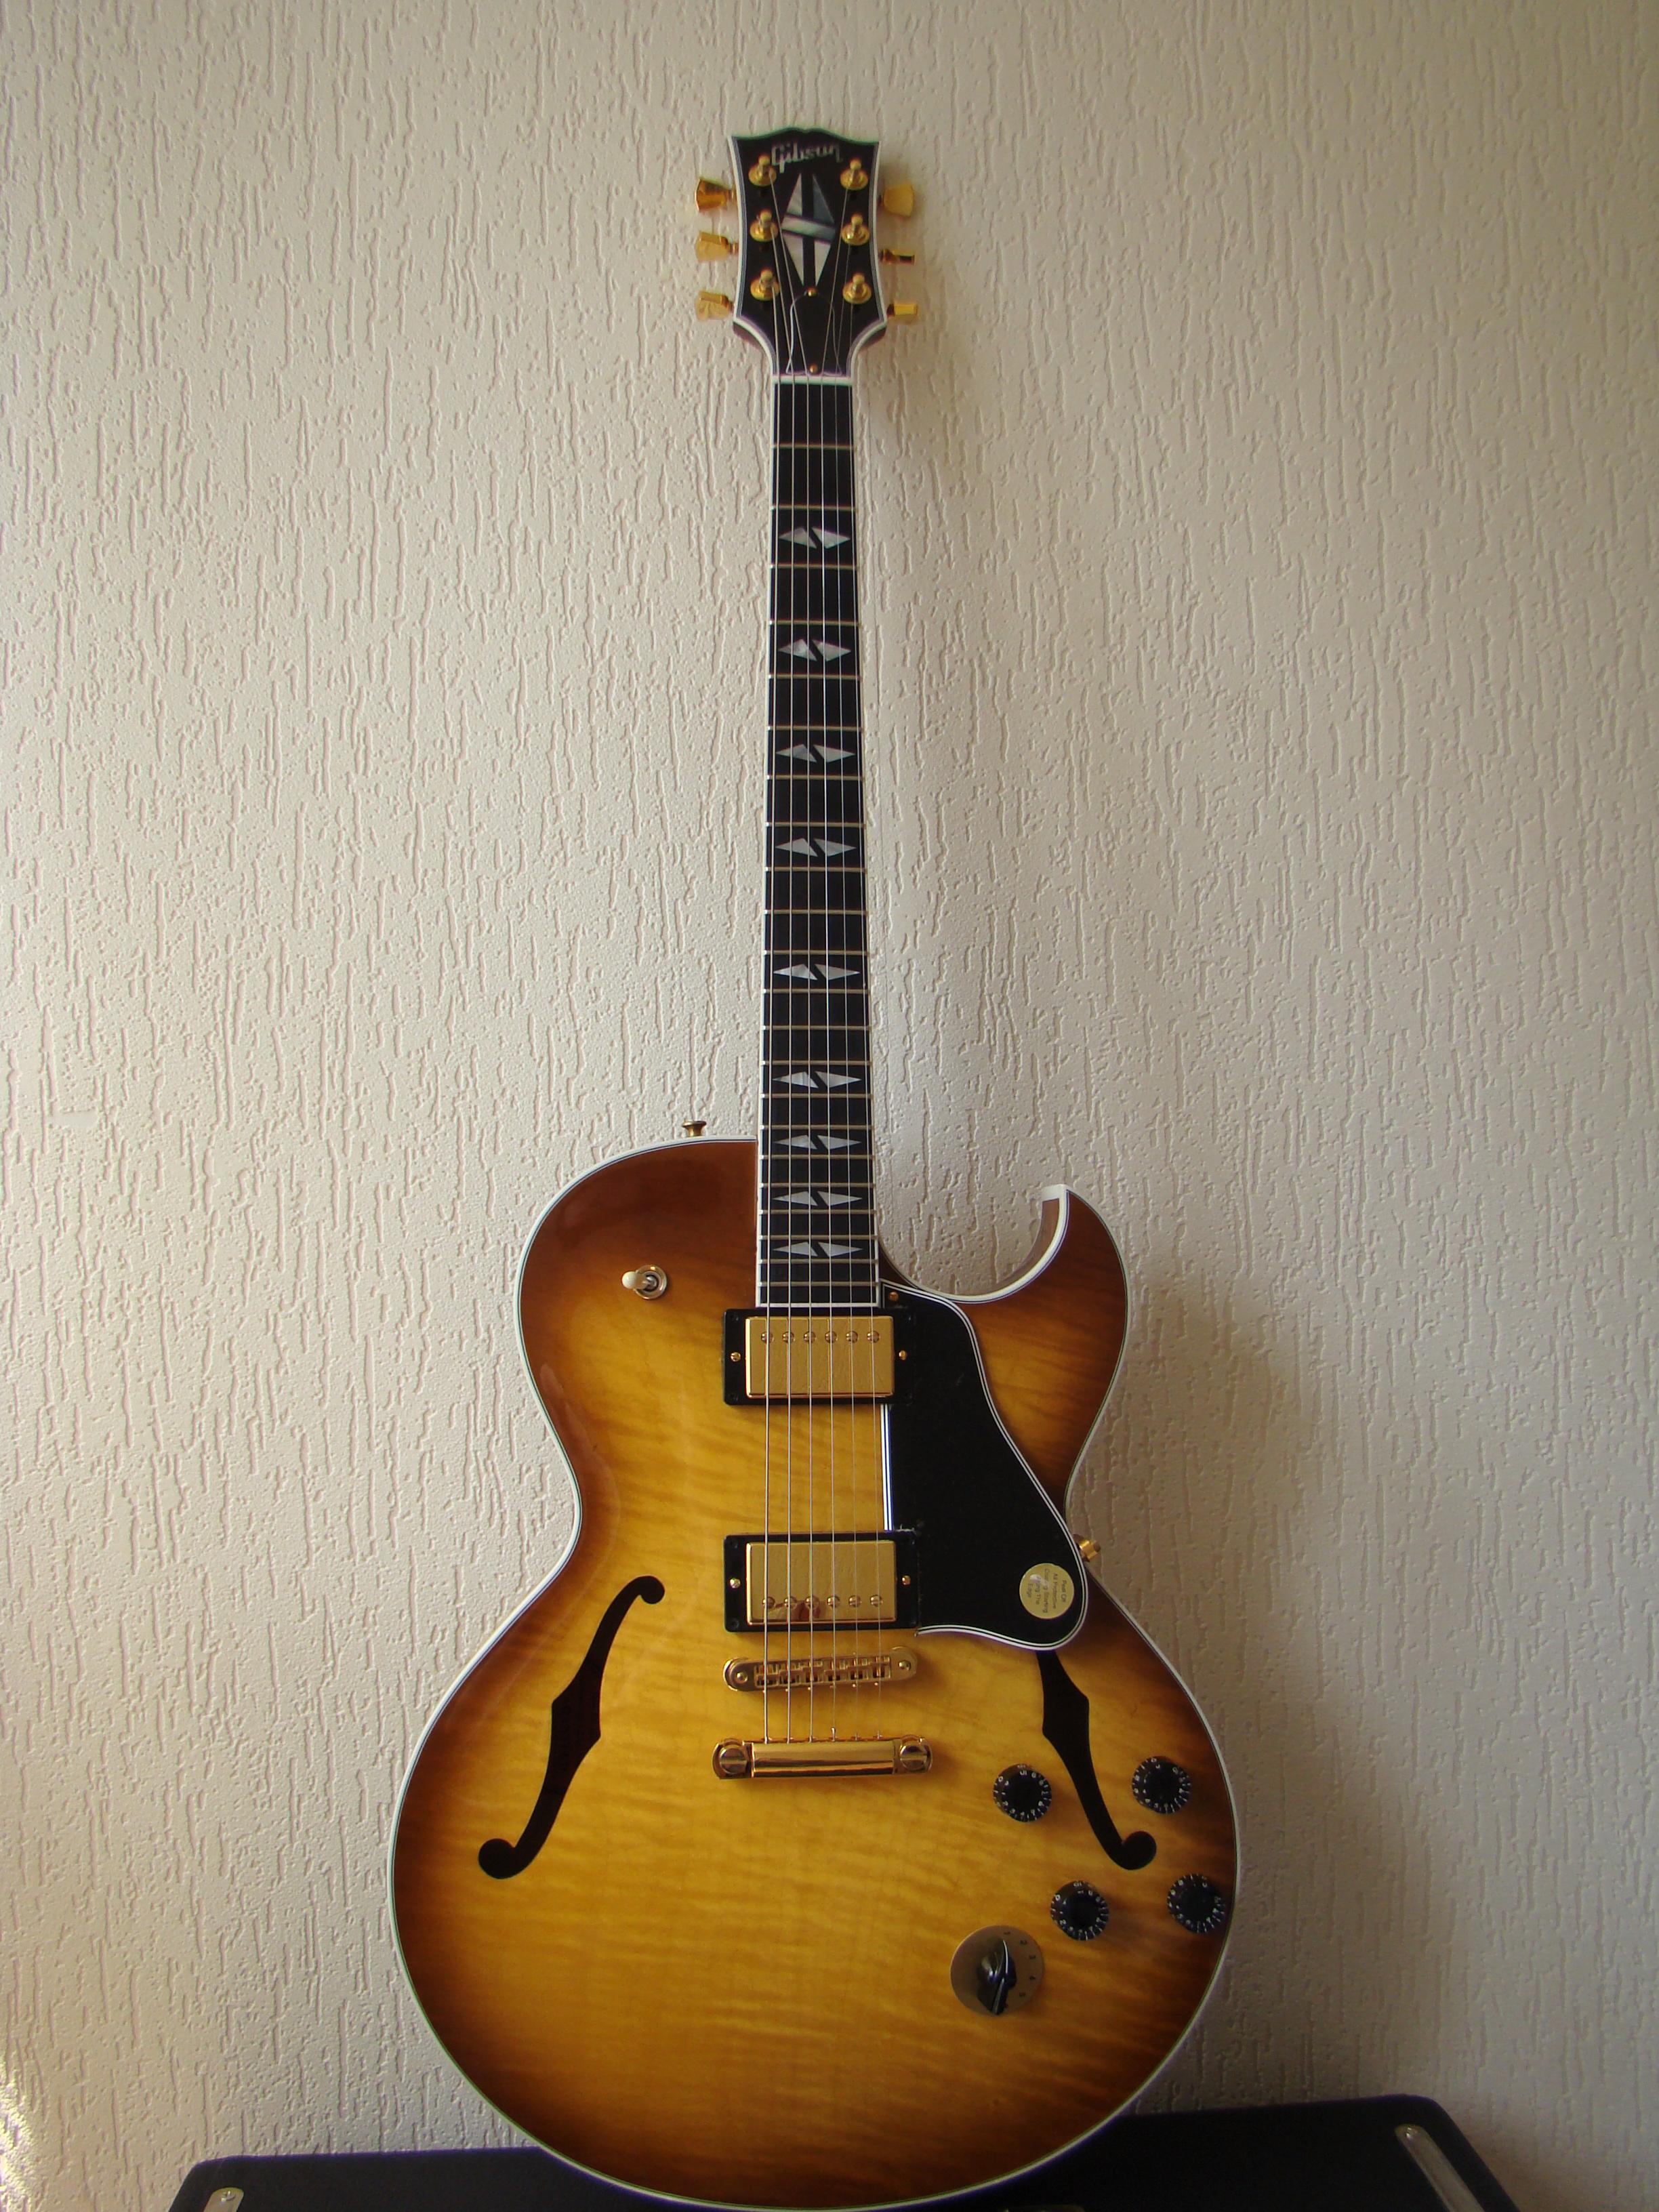 Wondrous Gibson Es 137 Classic Chrome Hardware Light Burst Image 418297 Largest Home Design Picture Inspirations Pitcheantrous